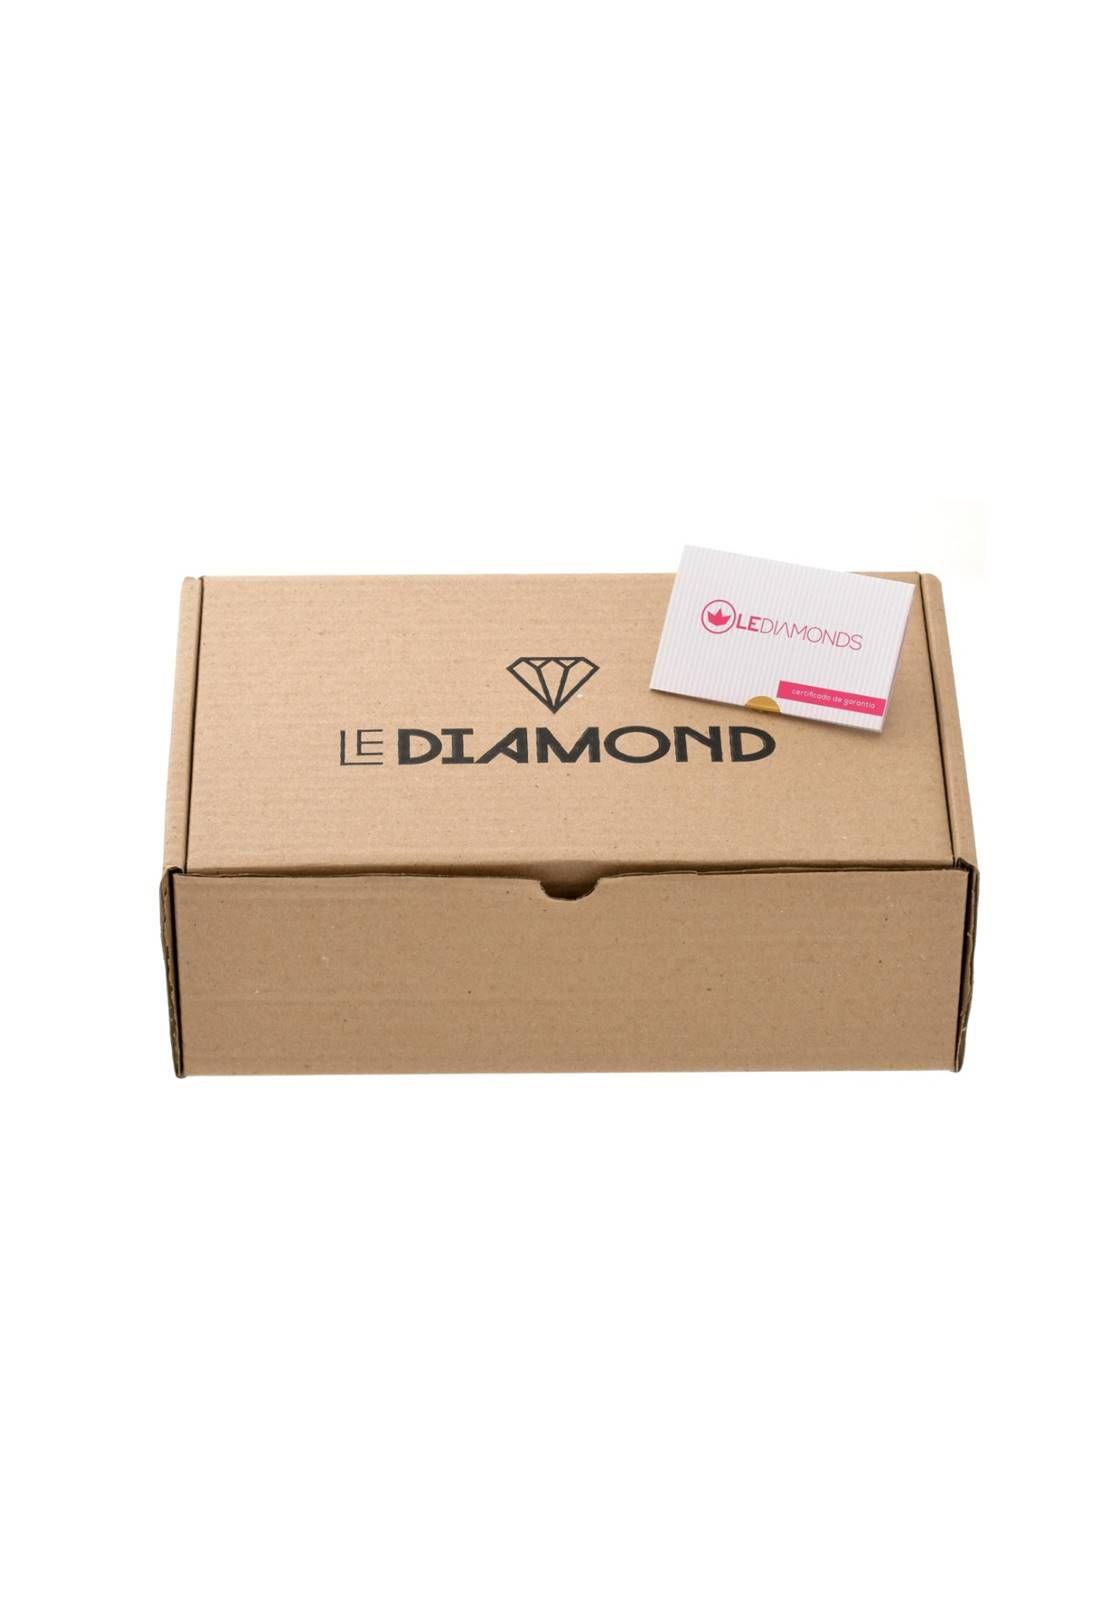 Brinco Le Diamond Triangular Acrílico Amarelo